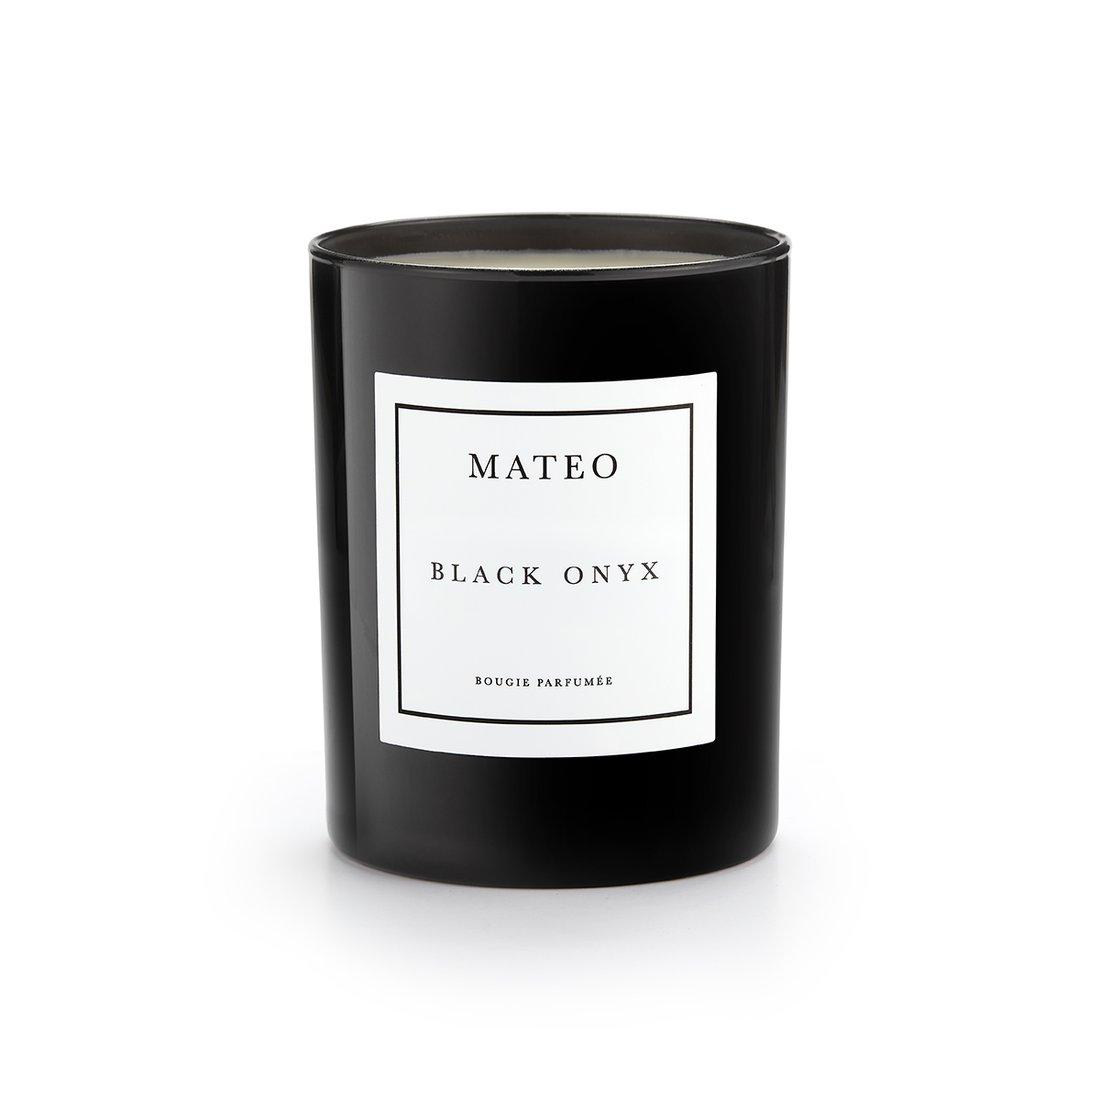 Black Onyx Candle by MATEO, $55 @mateonewyork.com